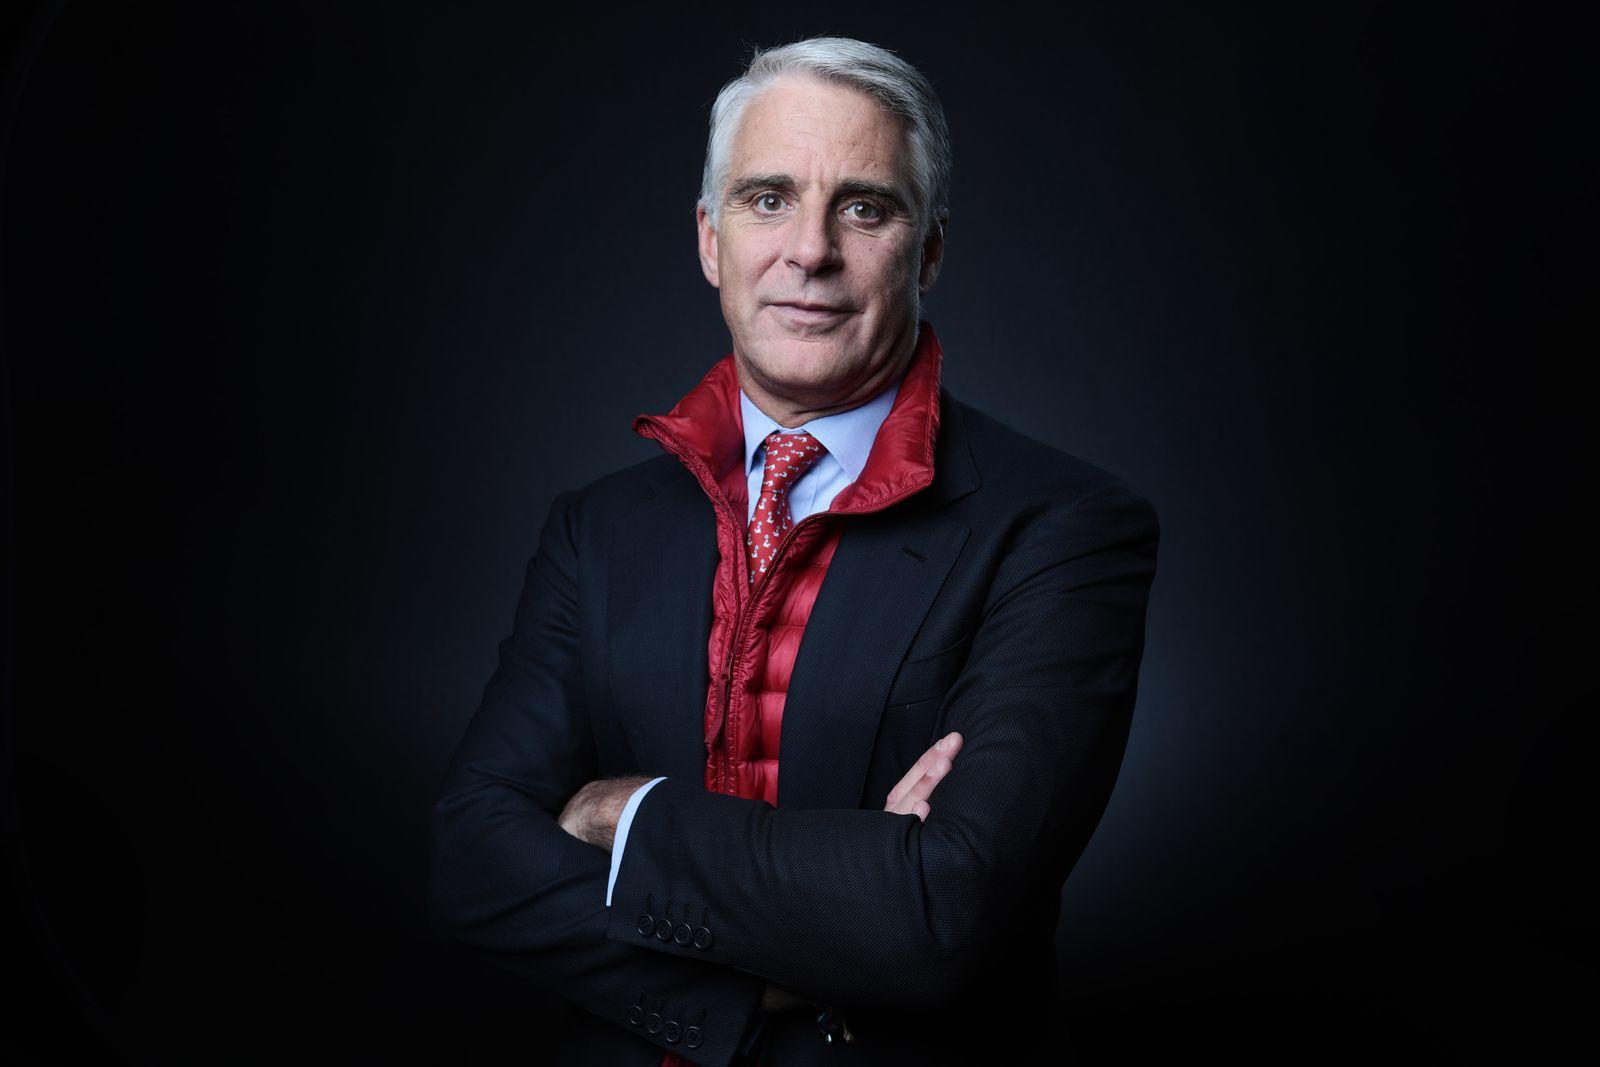 Closing Day Of The World Economic Forum (WEF) 2018